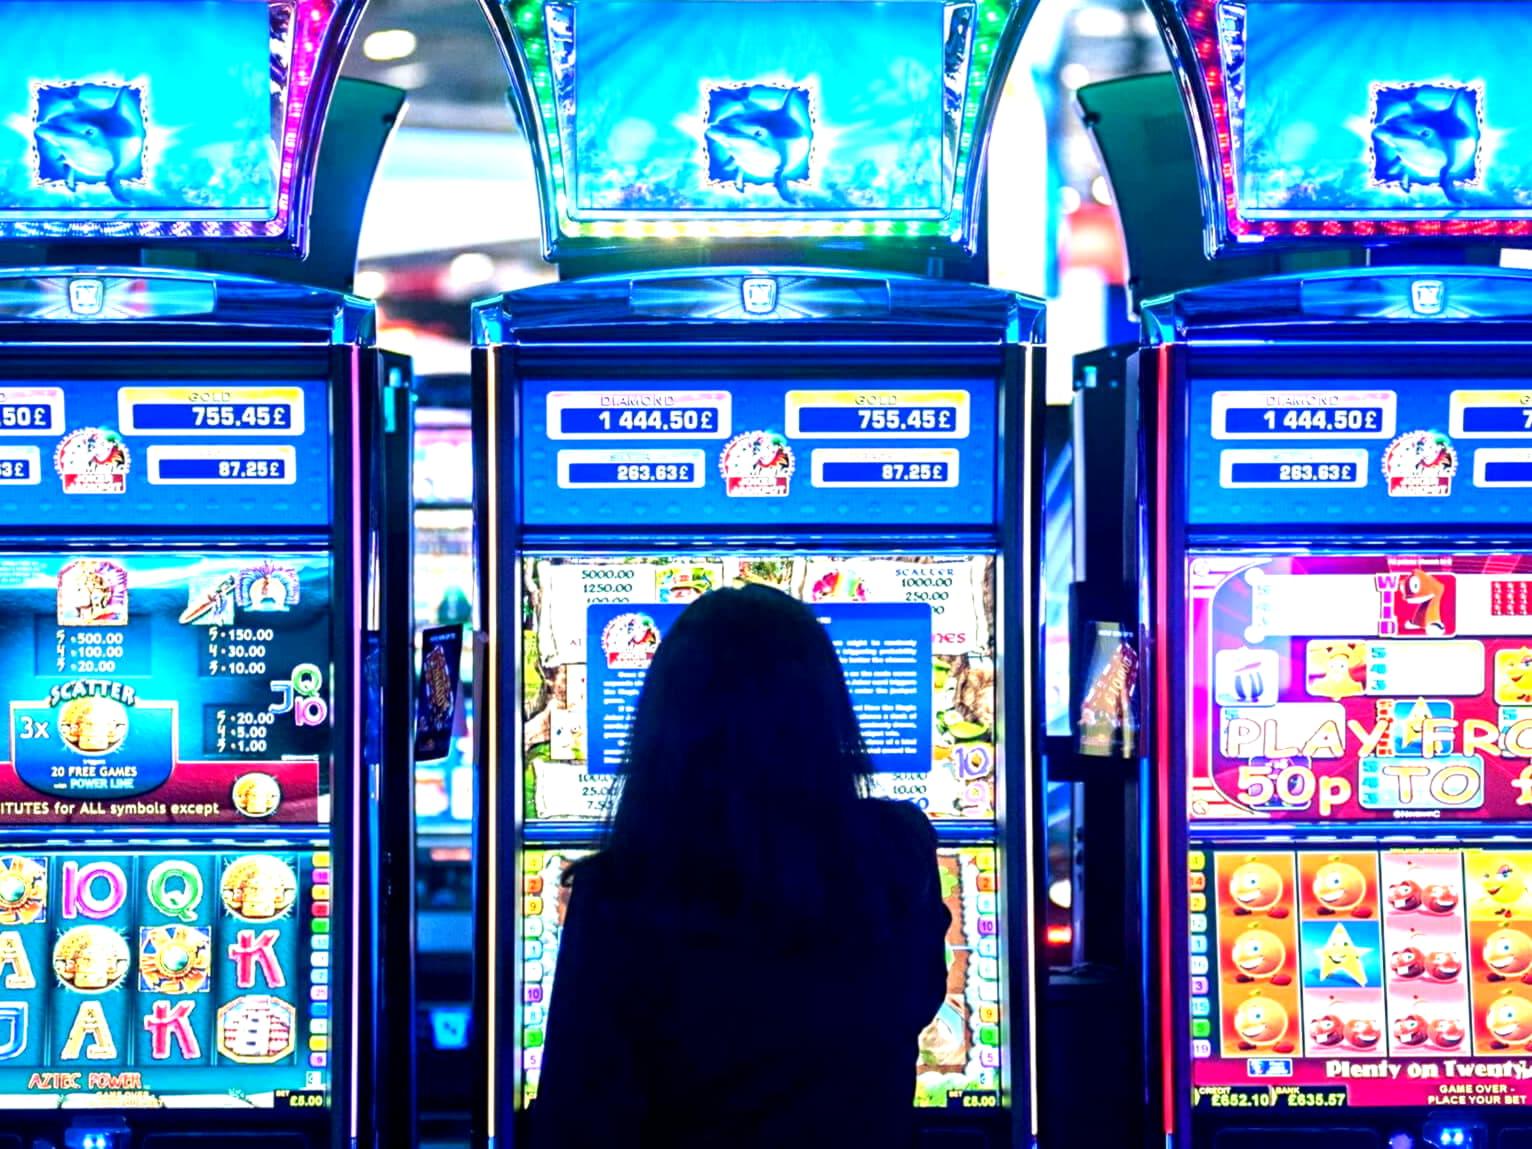 60% First Deposit Bonus at Thebes Casino